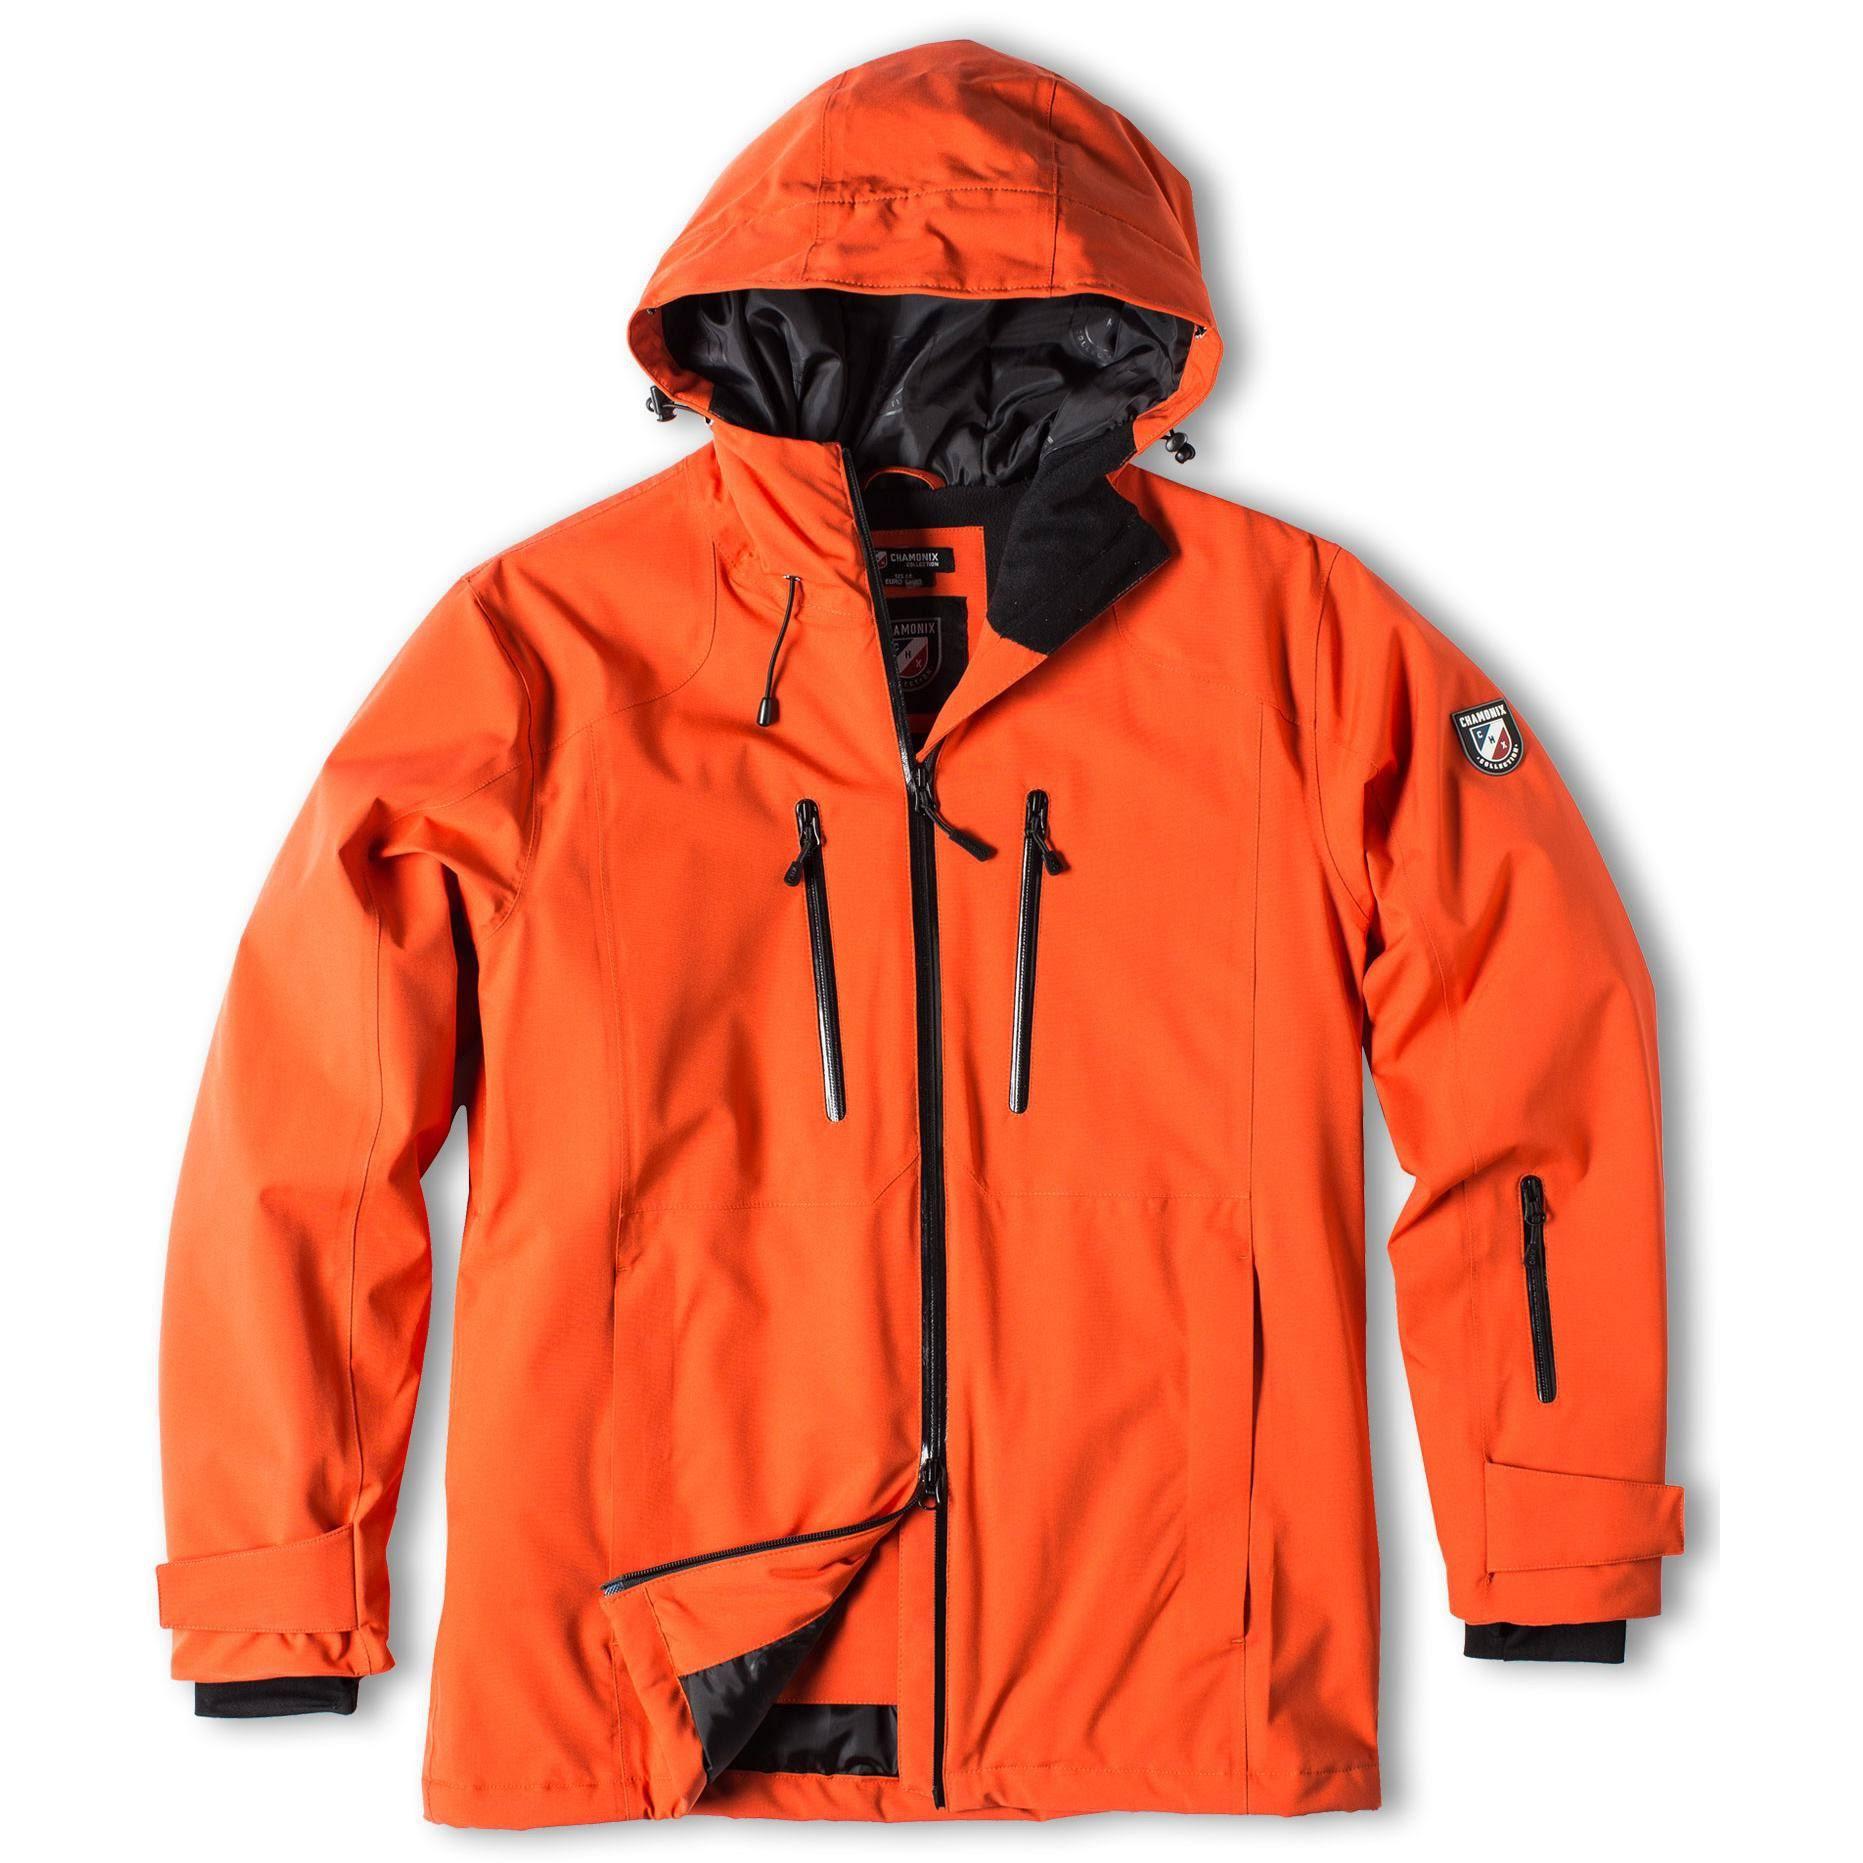 Sz S Chamonix Snowboardjacke Tanzac Orange Brick Herren 4n4FtIqg6